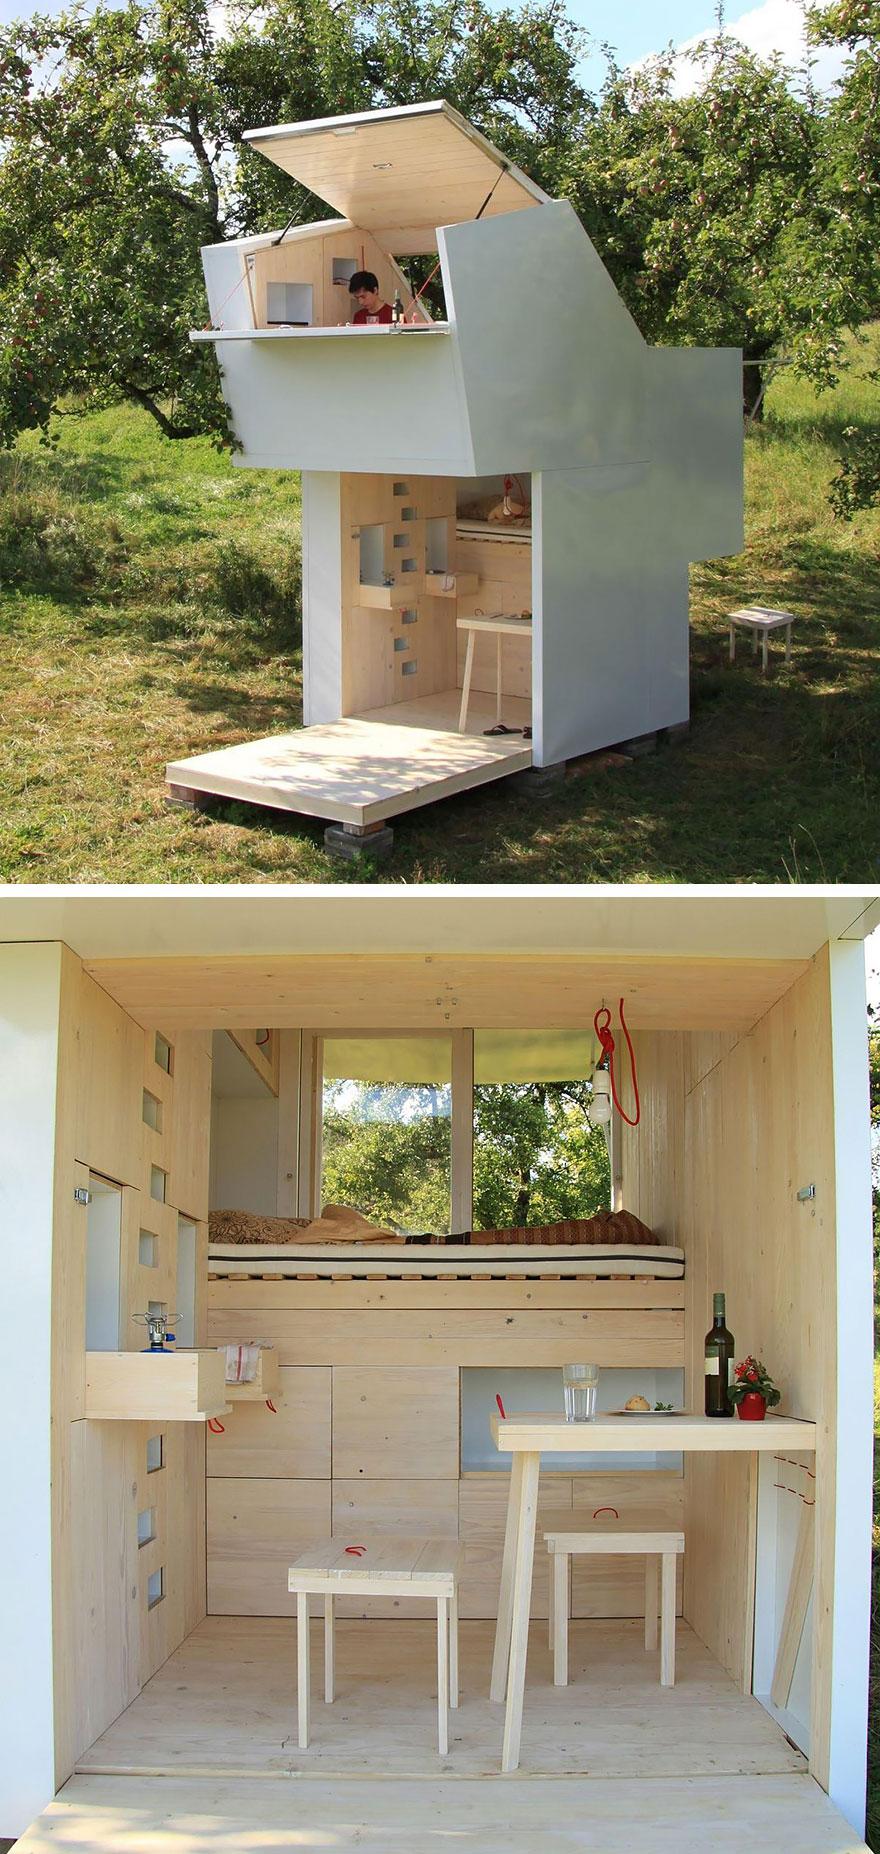 Picotswmjscozslnjhhl29gy2axoy9cojp3al9glf9fo3pgl29mqp1mojsfop1vmjelo29gyka0o3wum2hgnjeylkasp3imqtscozsvothgnj50mkwco3vgnjeylkzhnaoabedroom Small Home Designs For Space Door